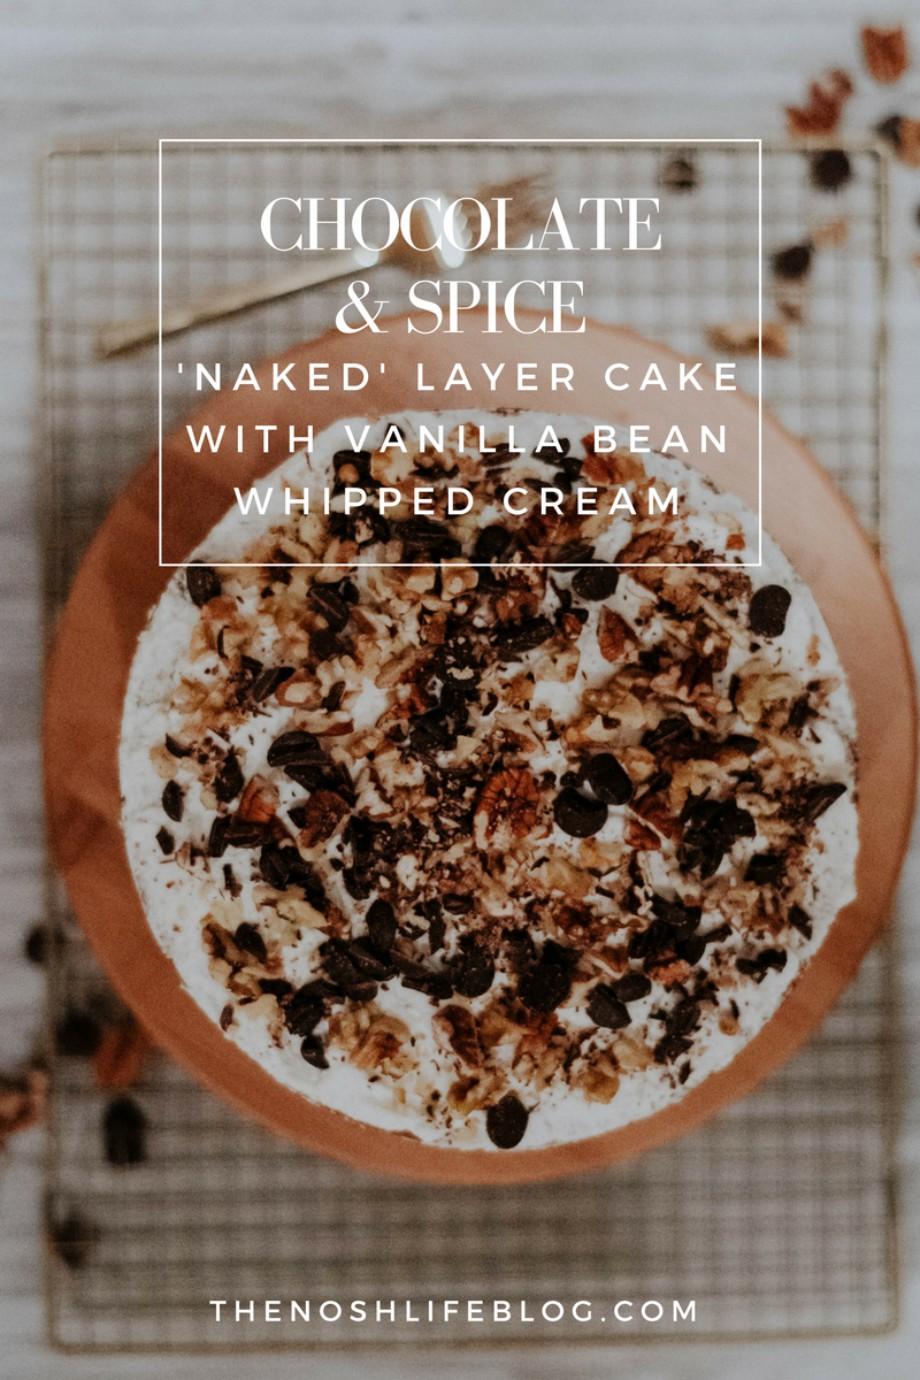 gluten-free-paleo-chocolate-spice-naked-cake